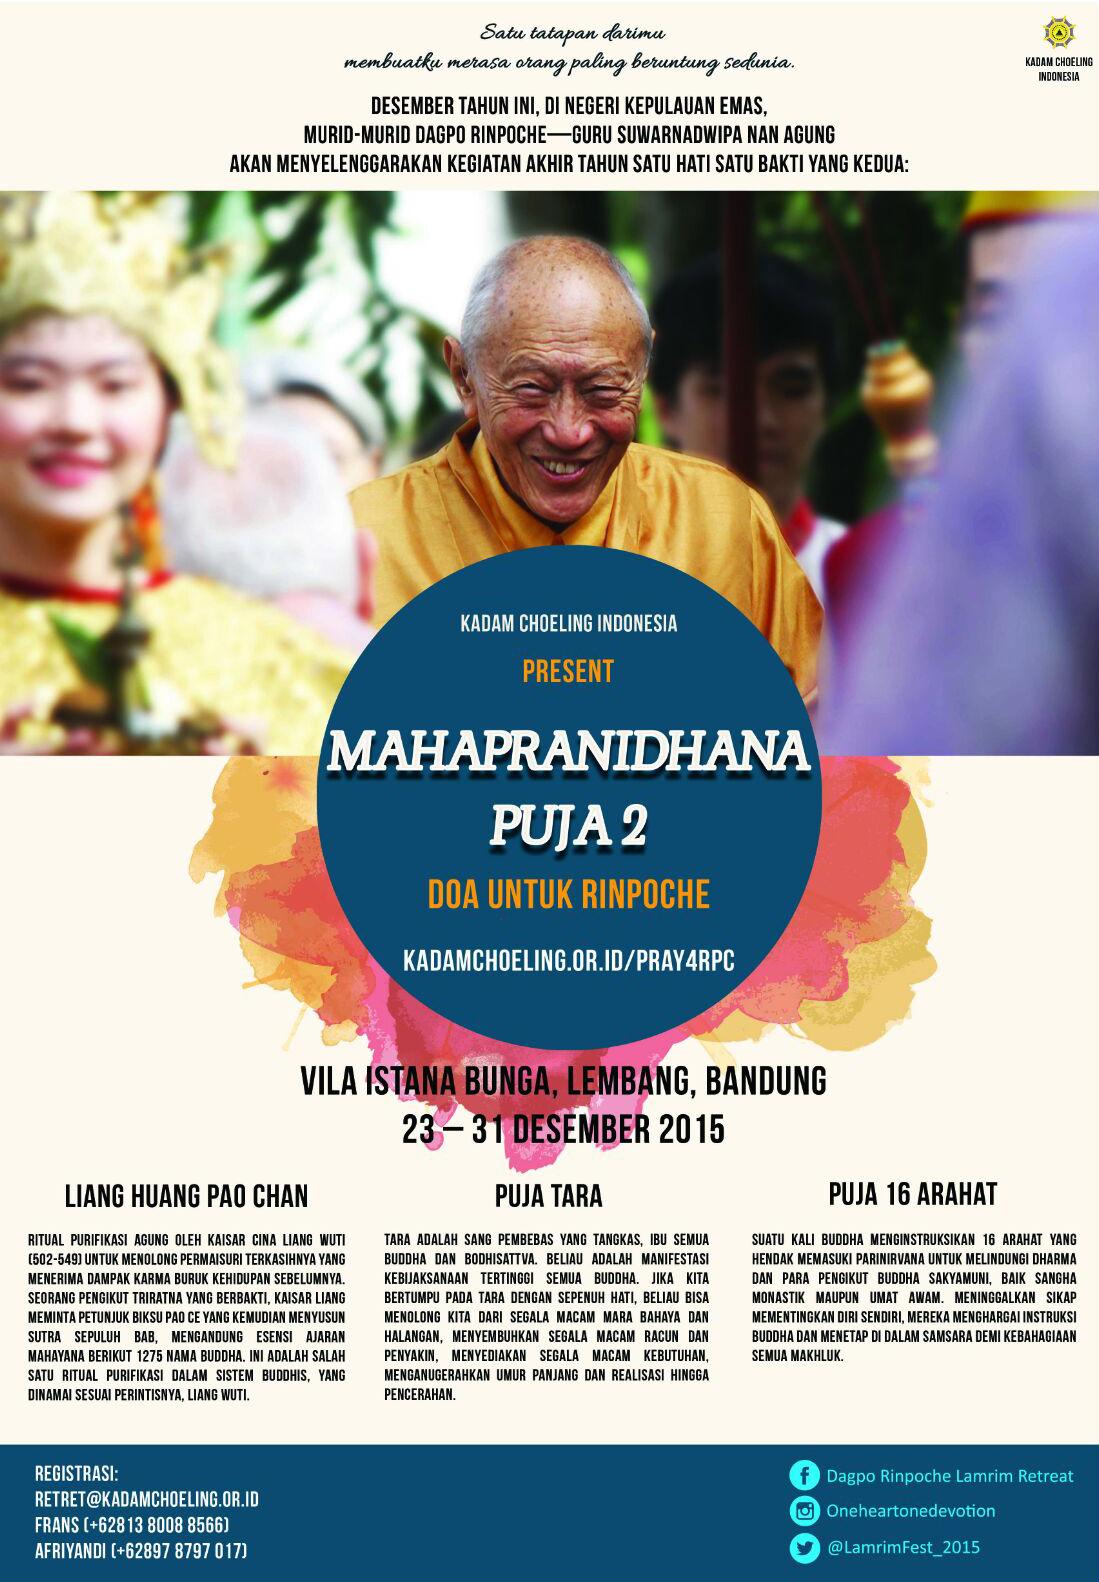 Mahapranidhana Puja 2